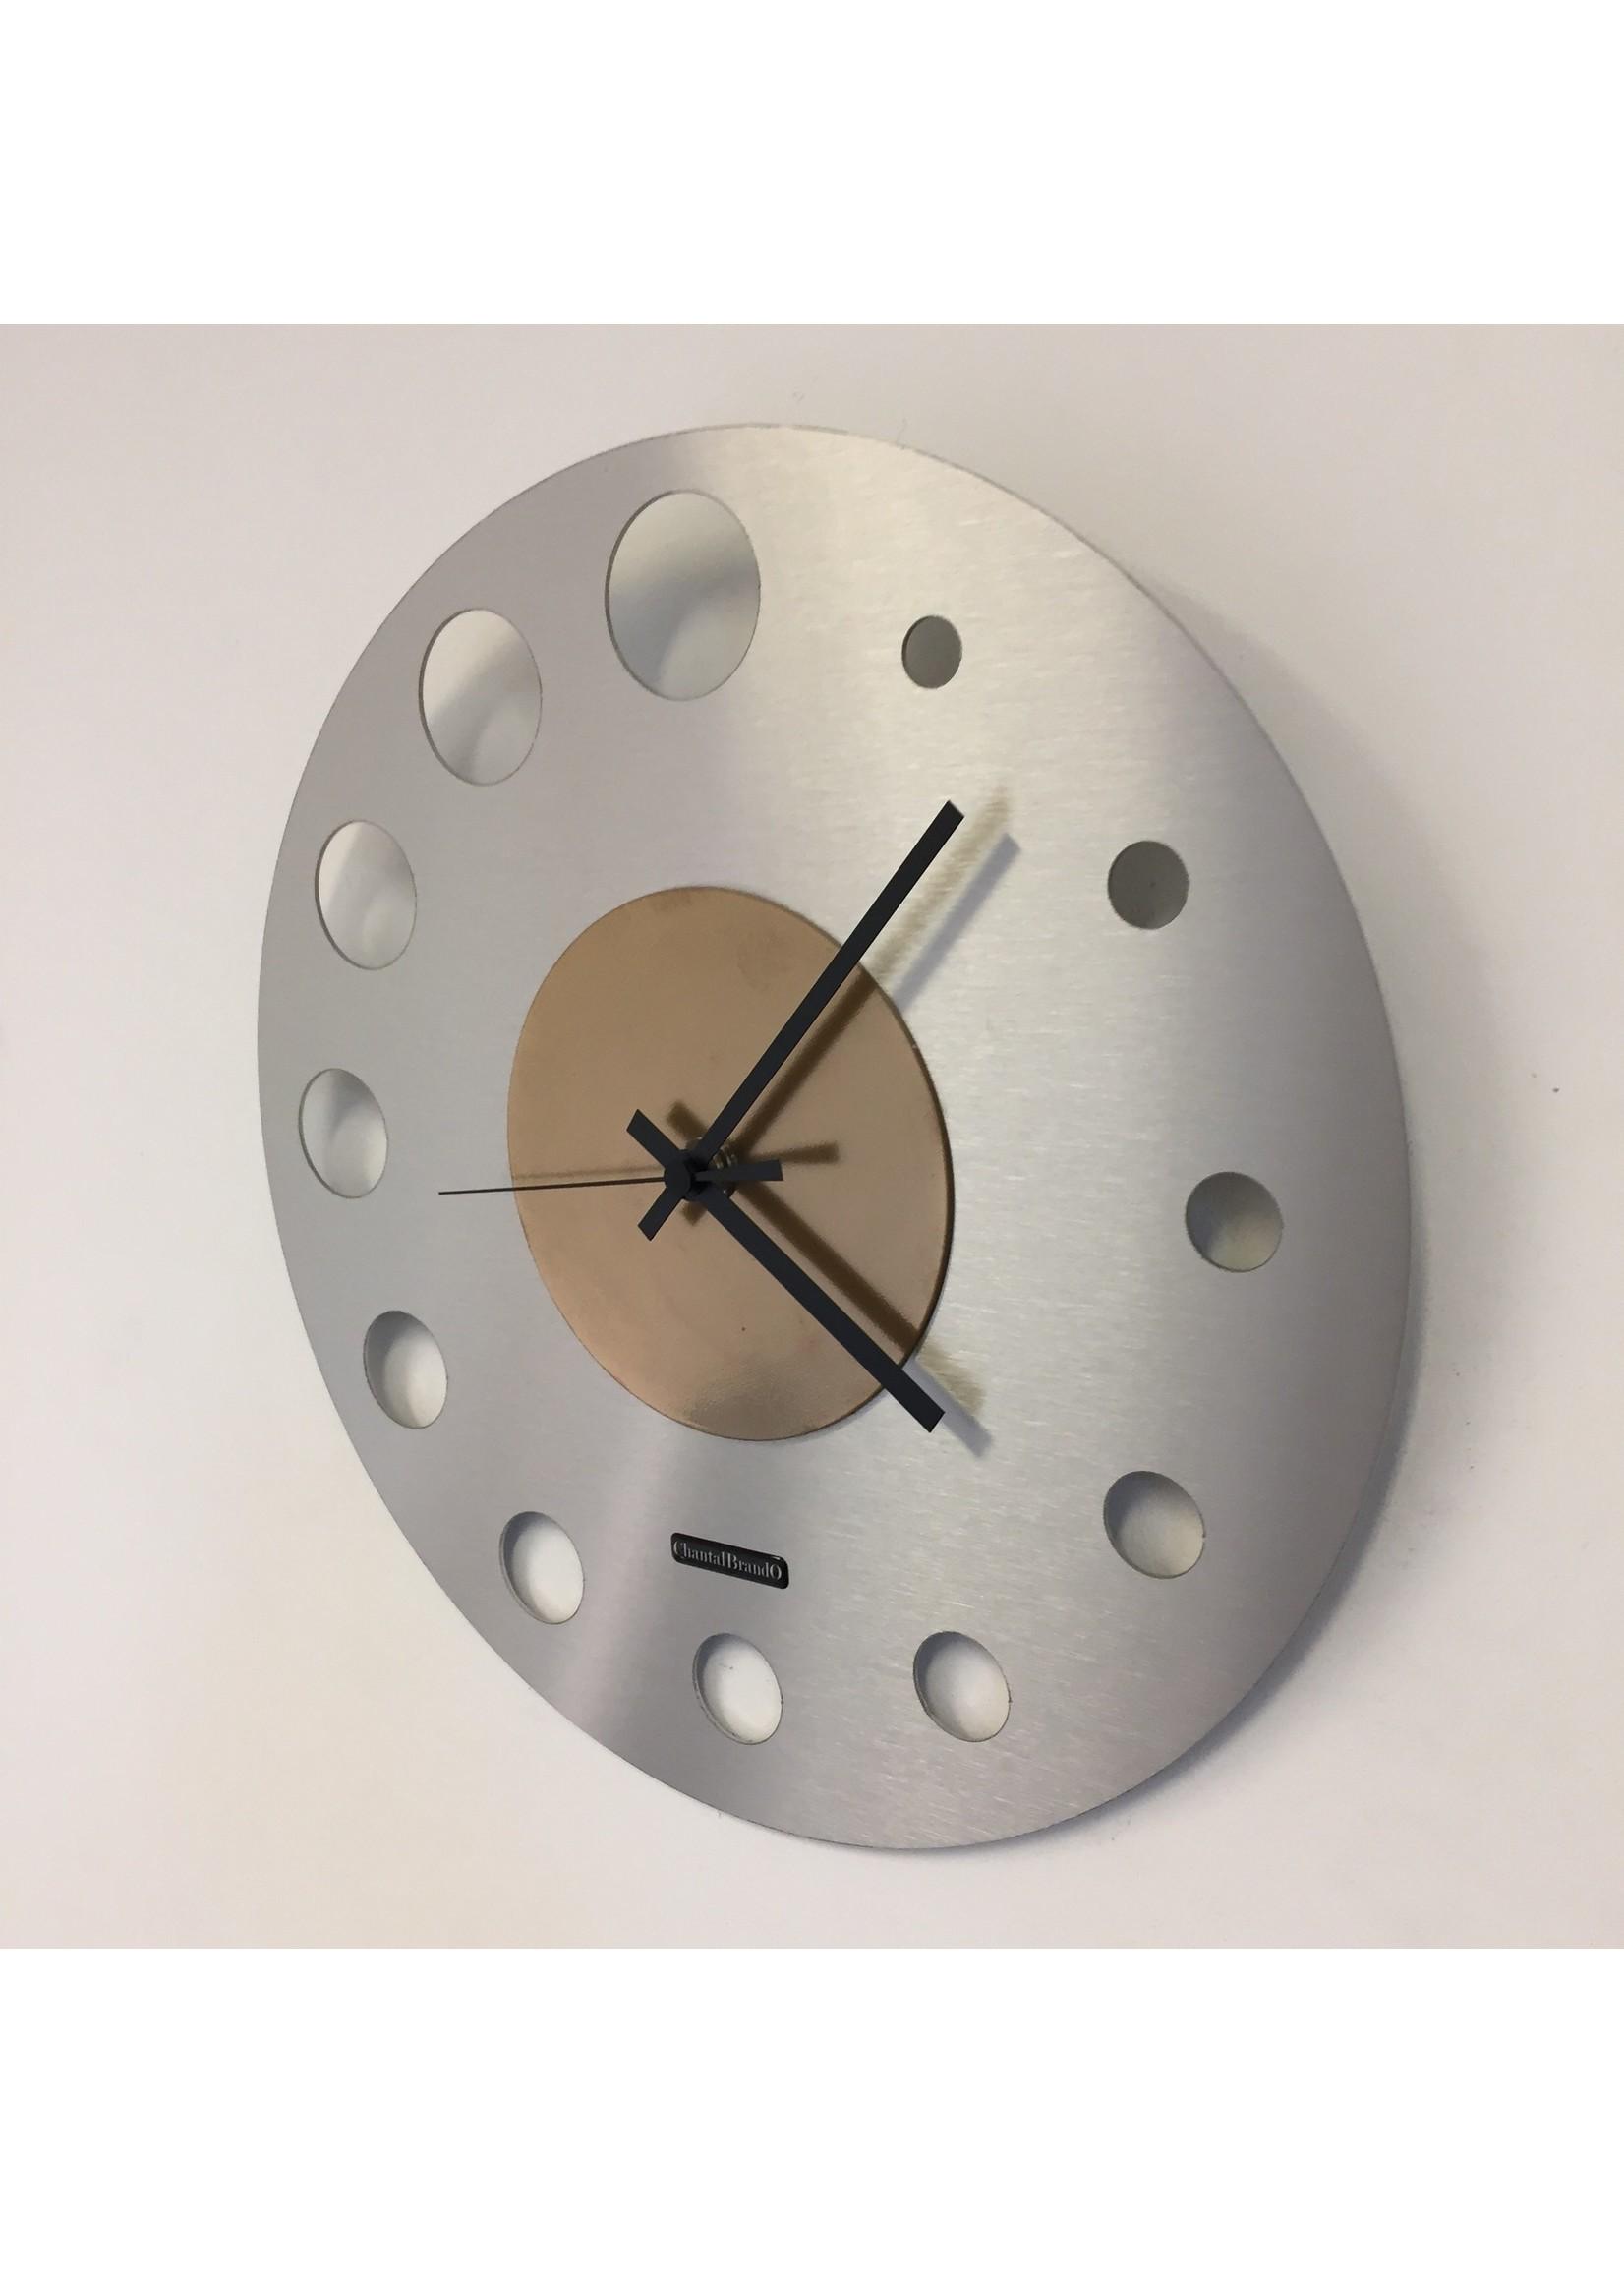 Klokkendiscounter Wandklok JUNTE BRUSSEL ATOMIUM GOLD Modern Design